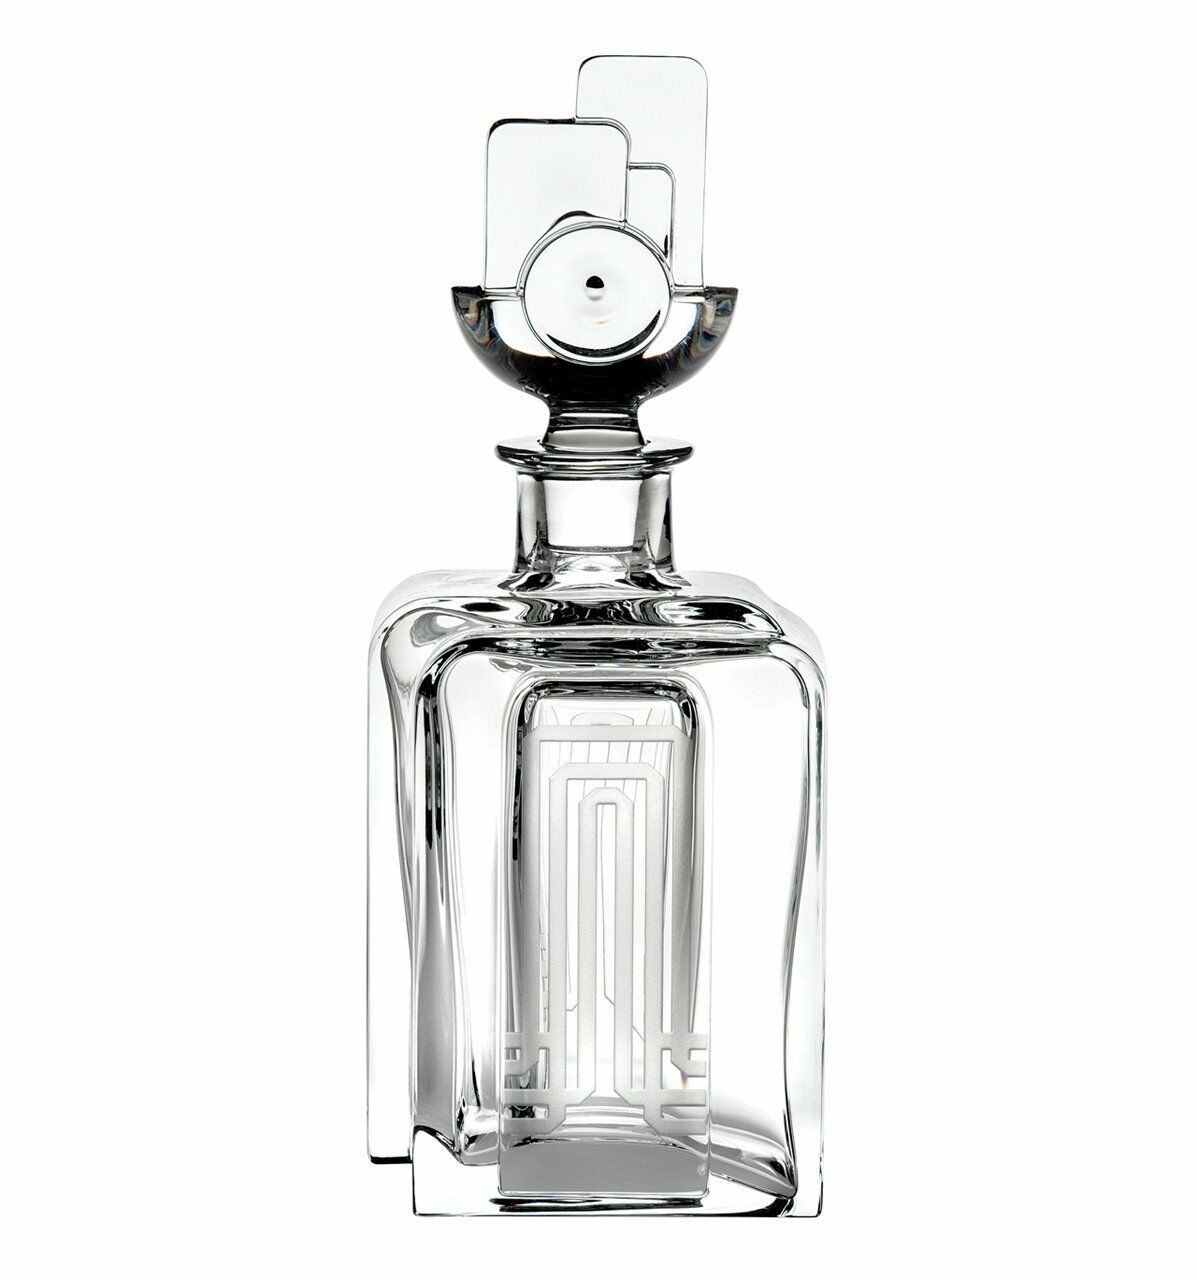 VISTA ALEGRE-Cinéma-whisky decanter (ref   48000773) Handmade Crystal